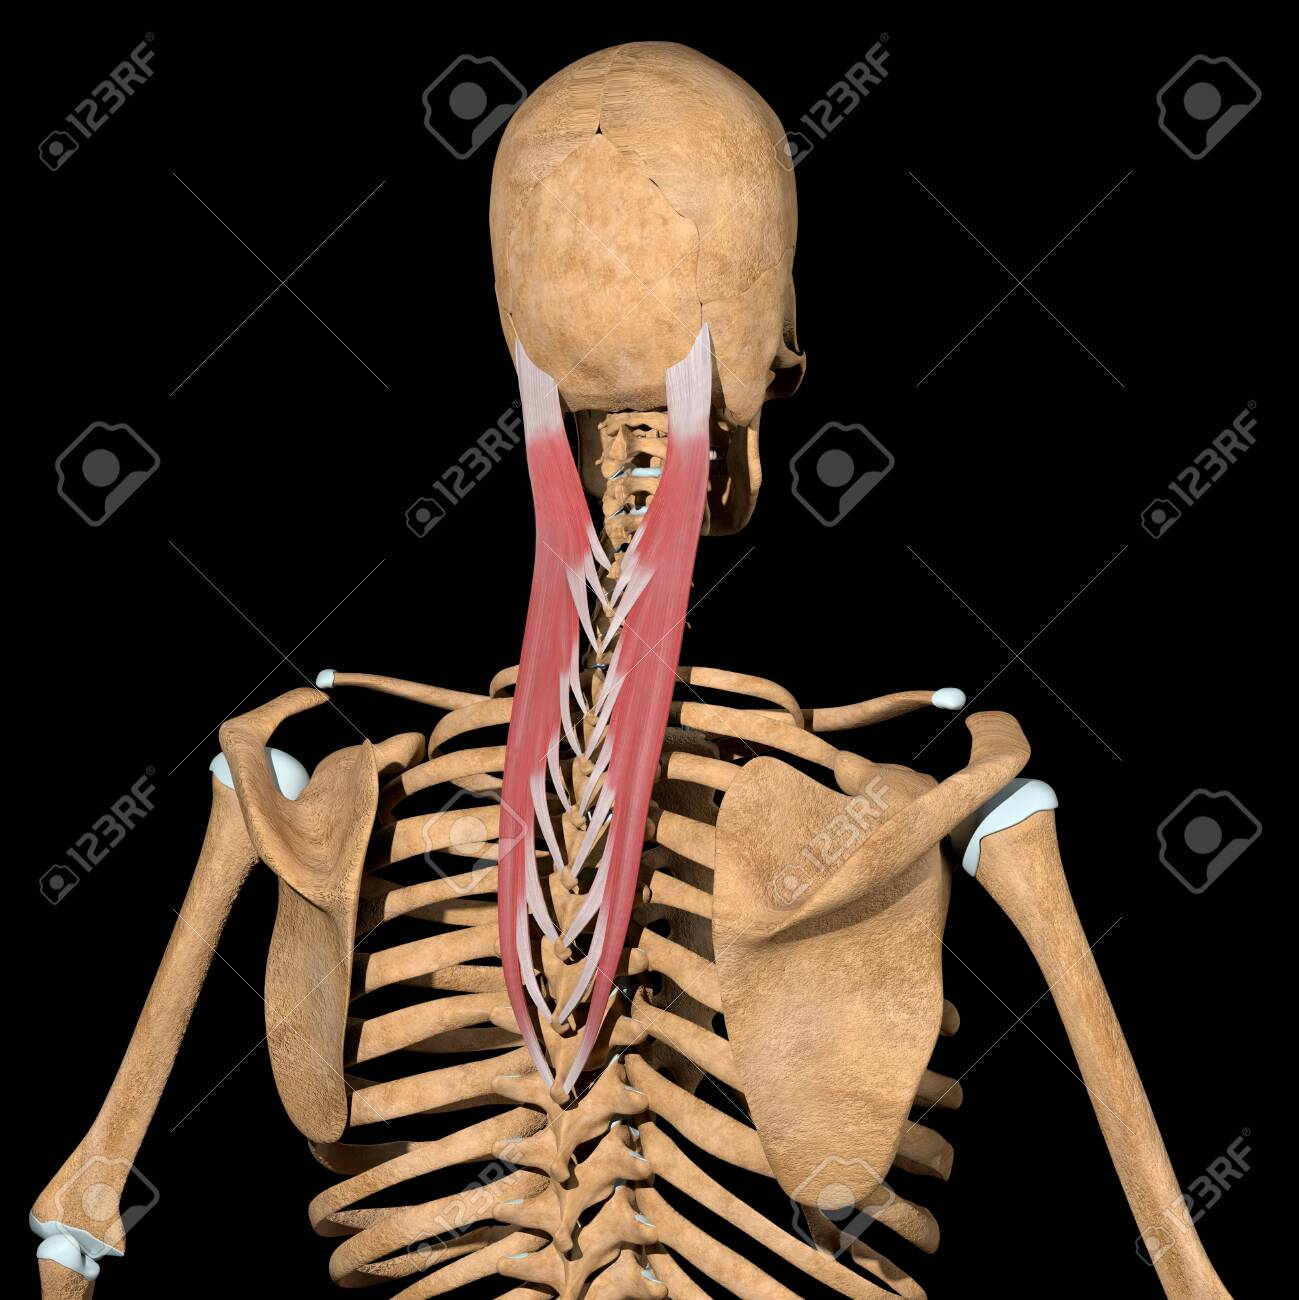 This 3d illustration shows the splenius capitis muscles on skeleton - 142010047